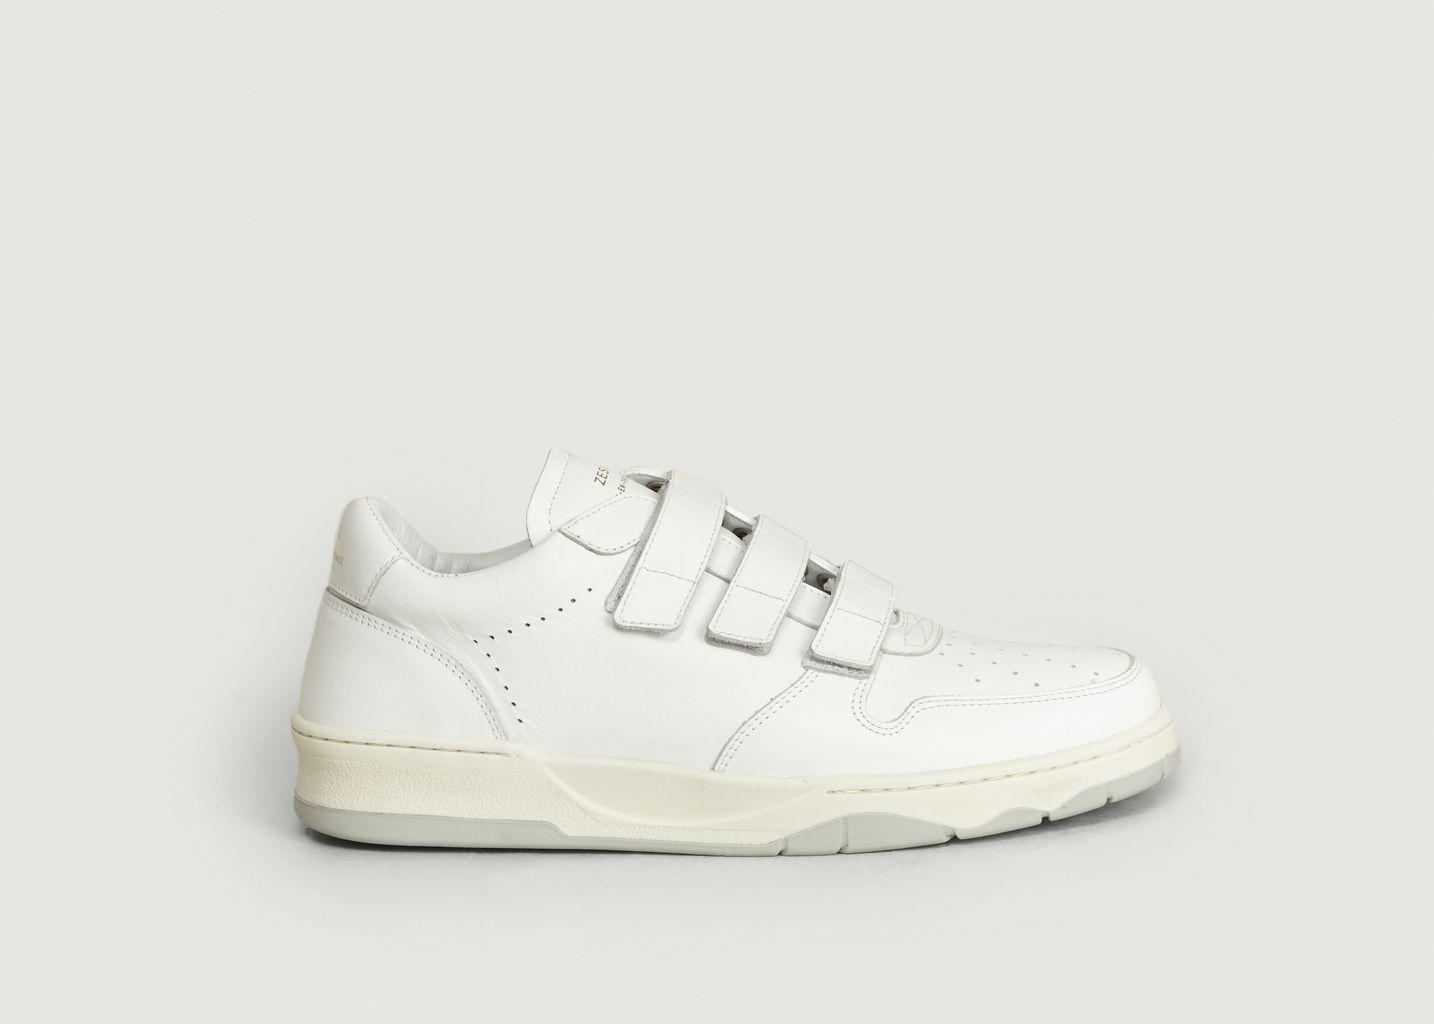 Sneakers ZSP23 à Velcro - Zespa